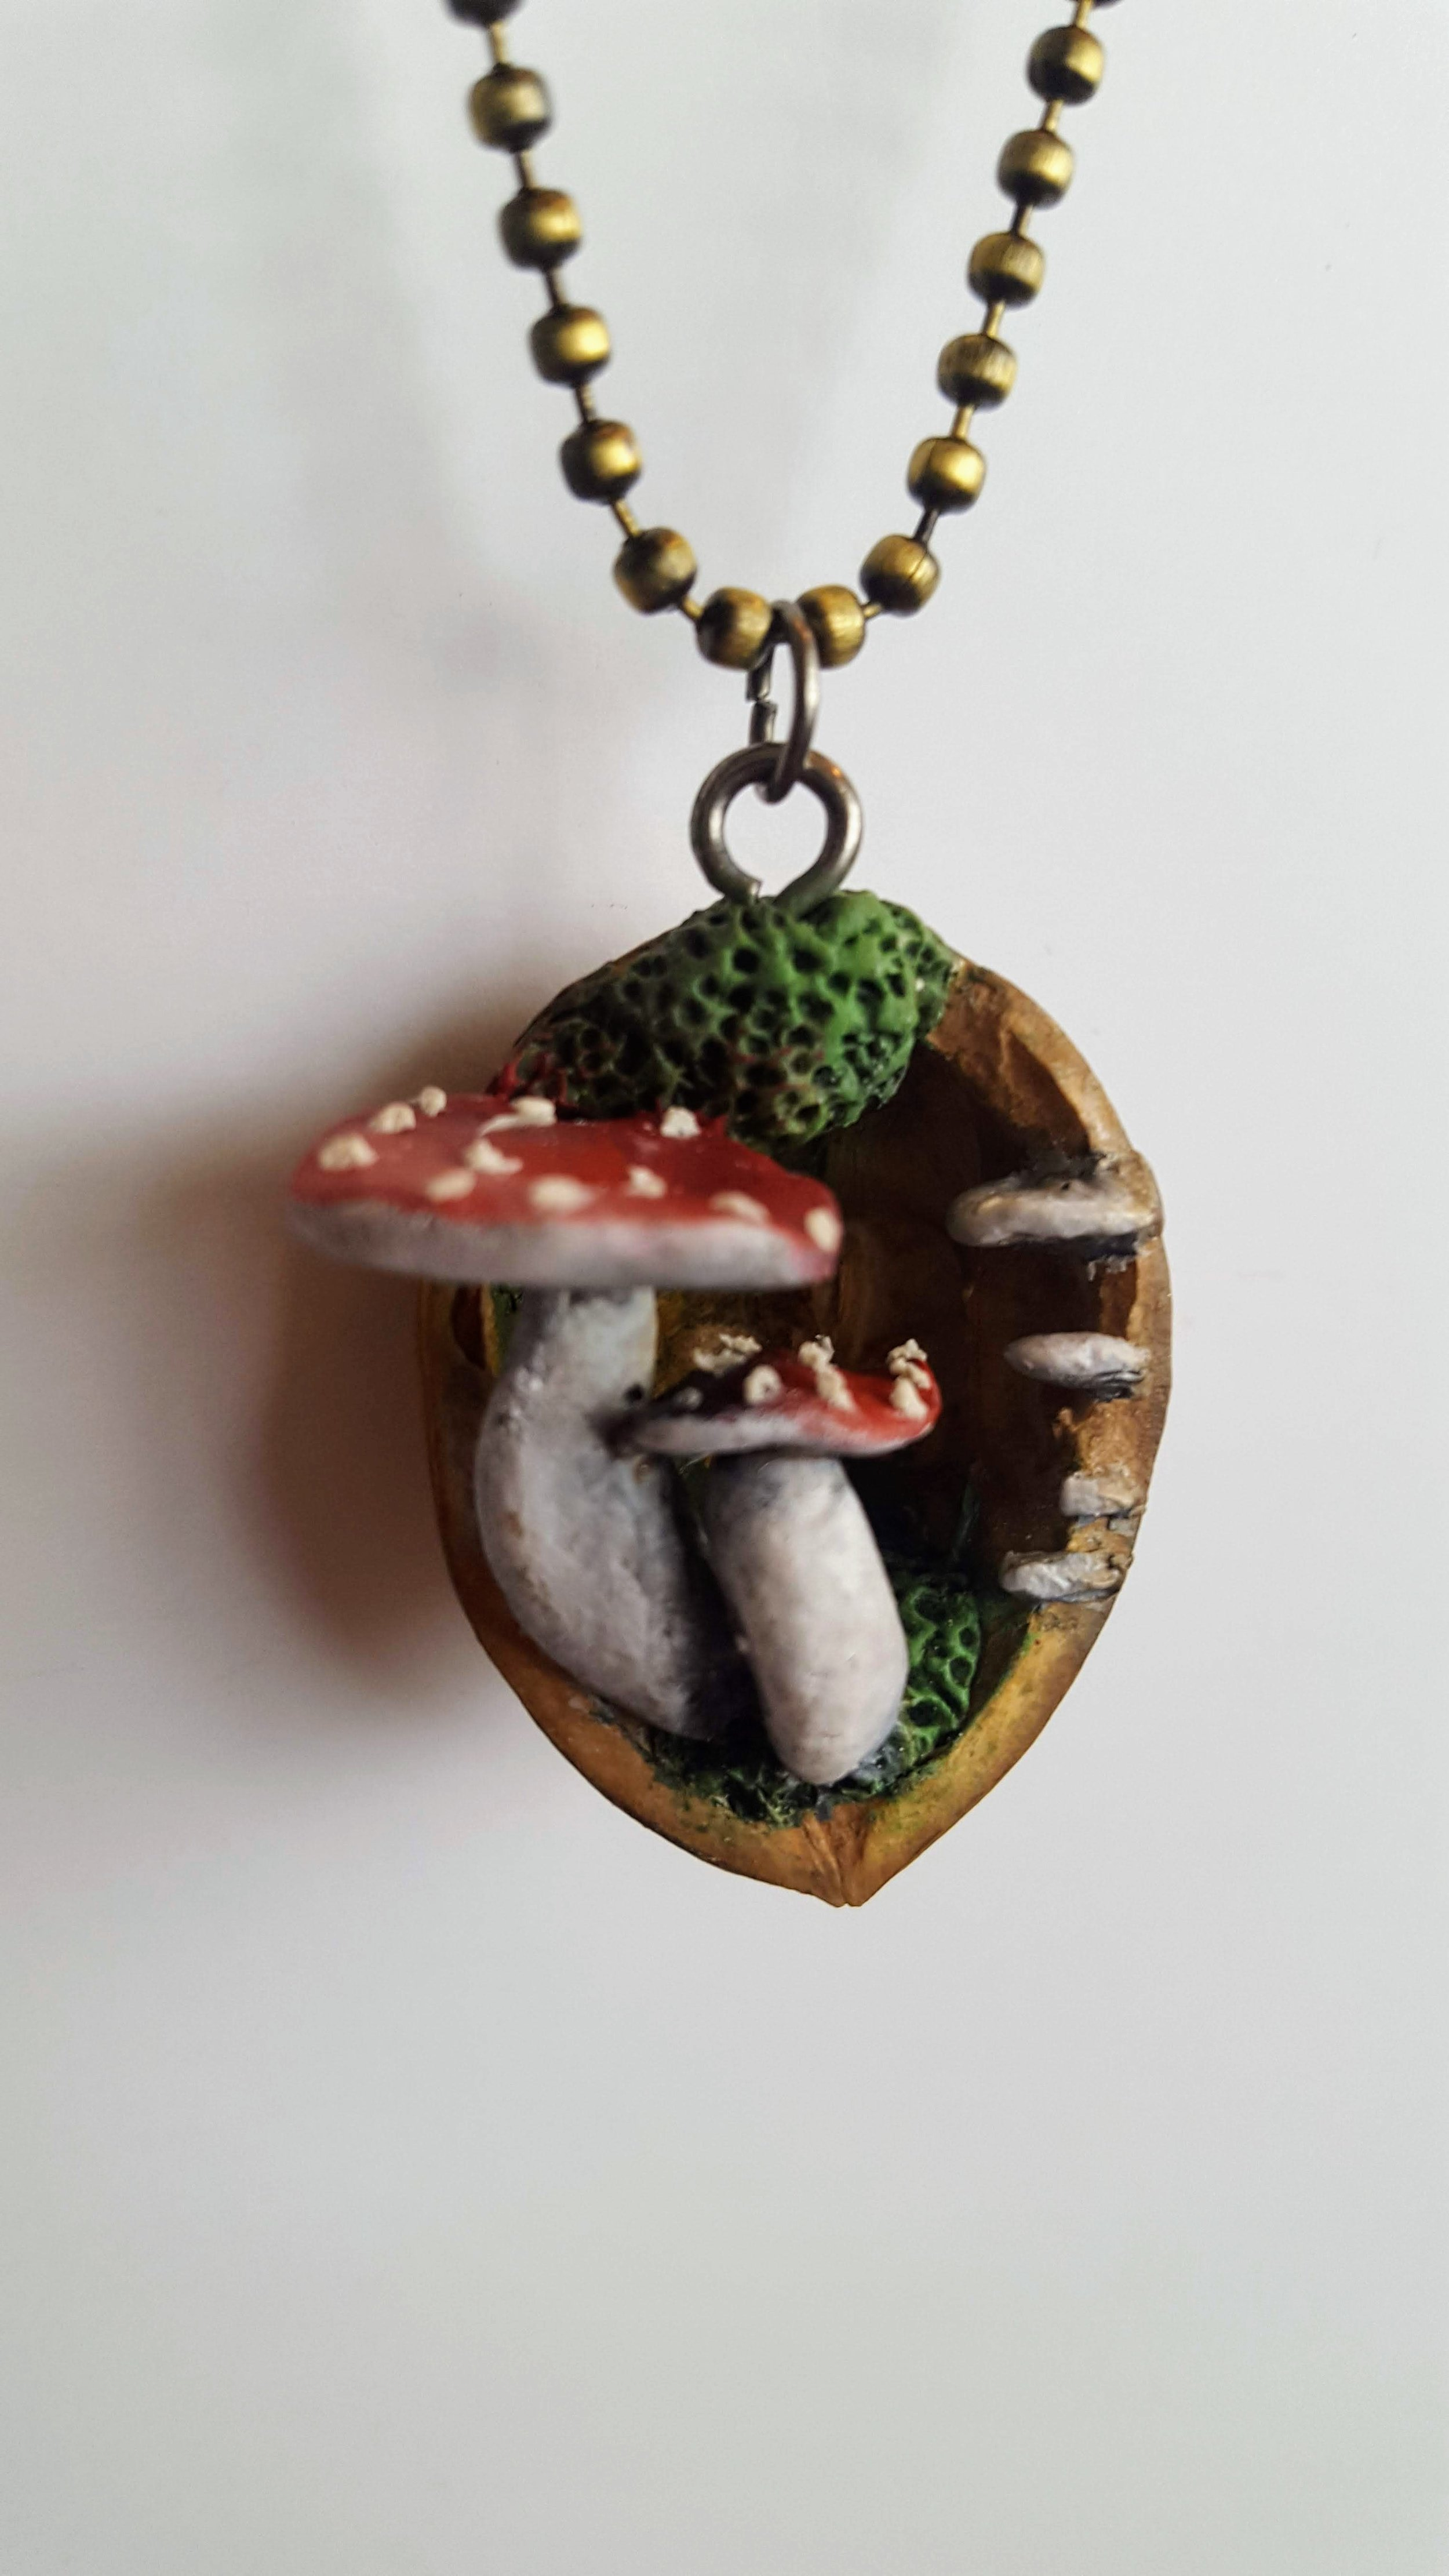 Walnut Mushroom PEndant - Buy Now!